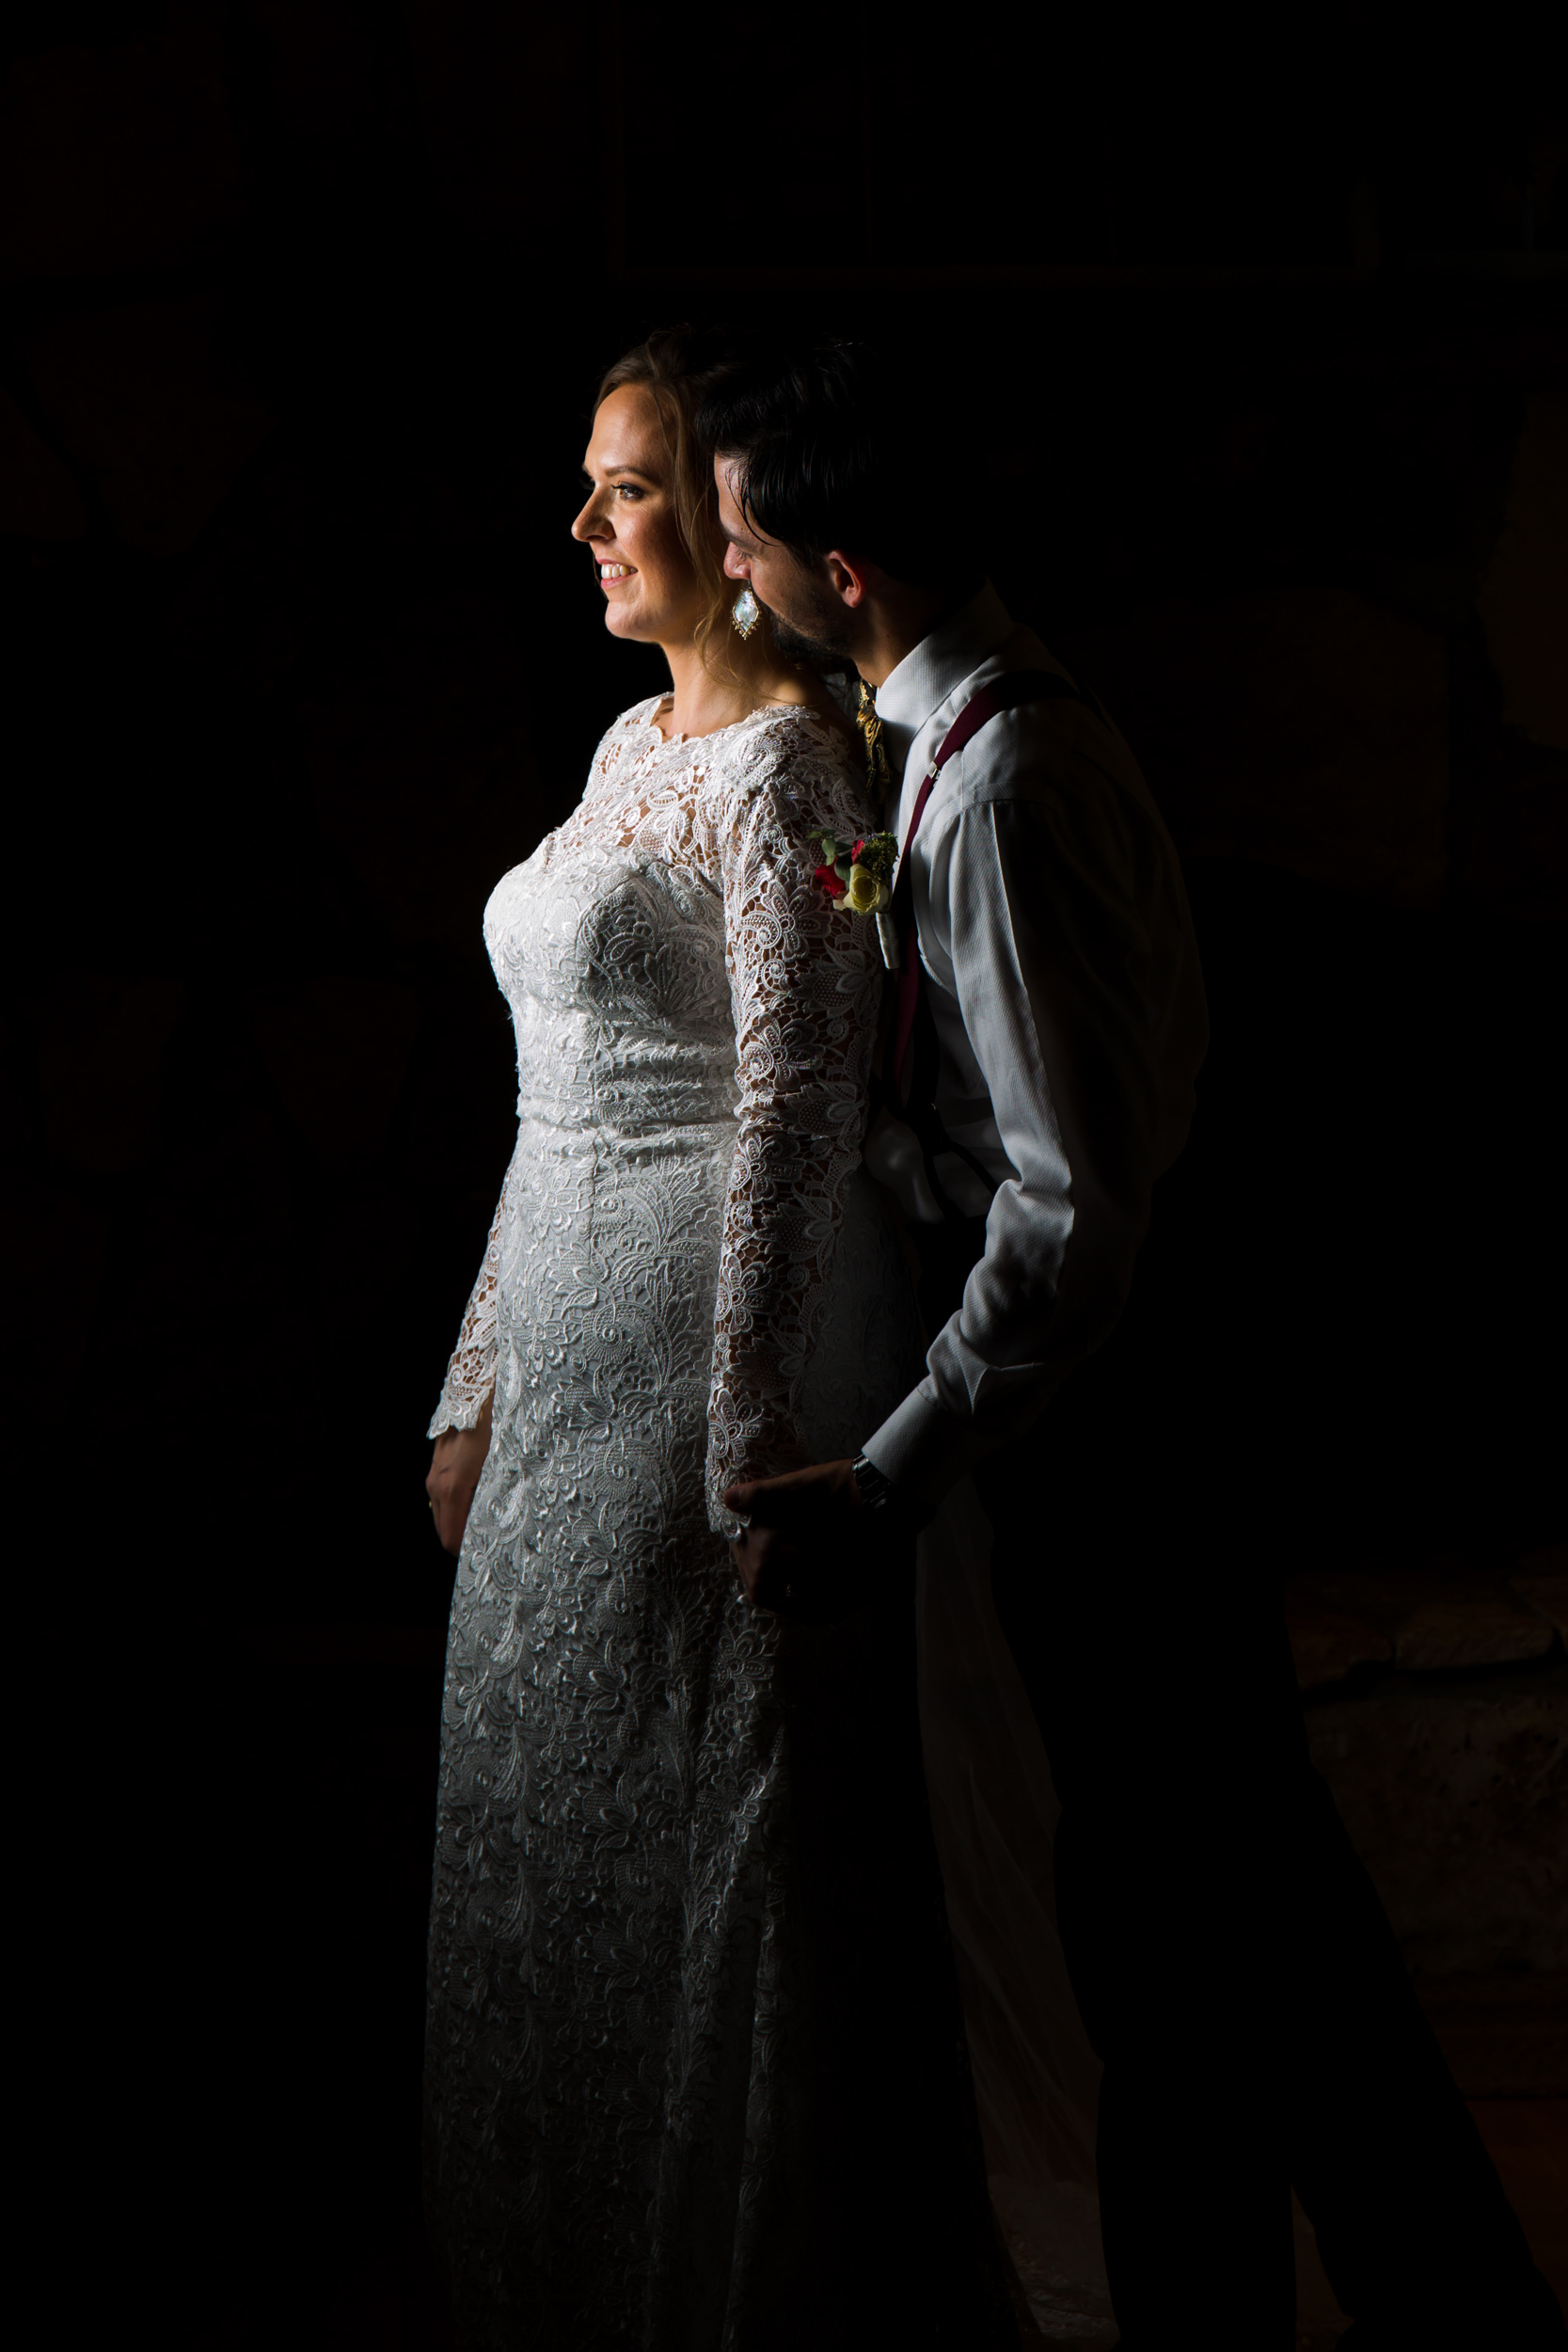 austin-wedding-colorful-36.jpg